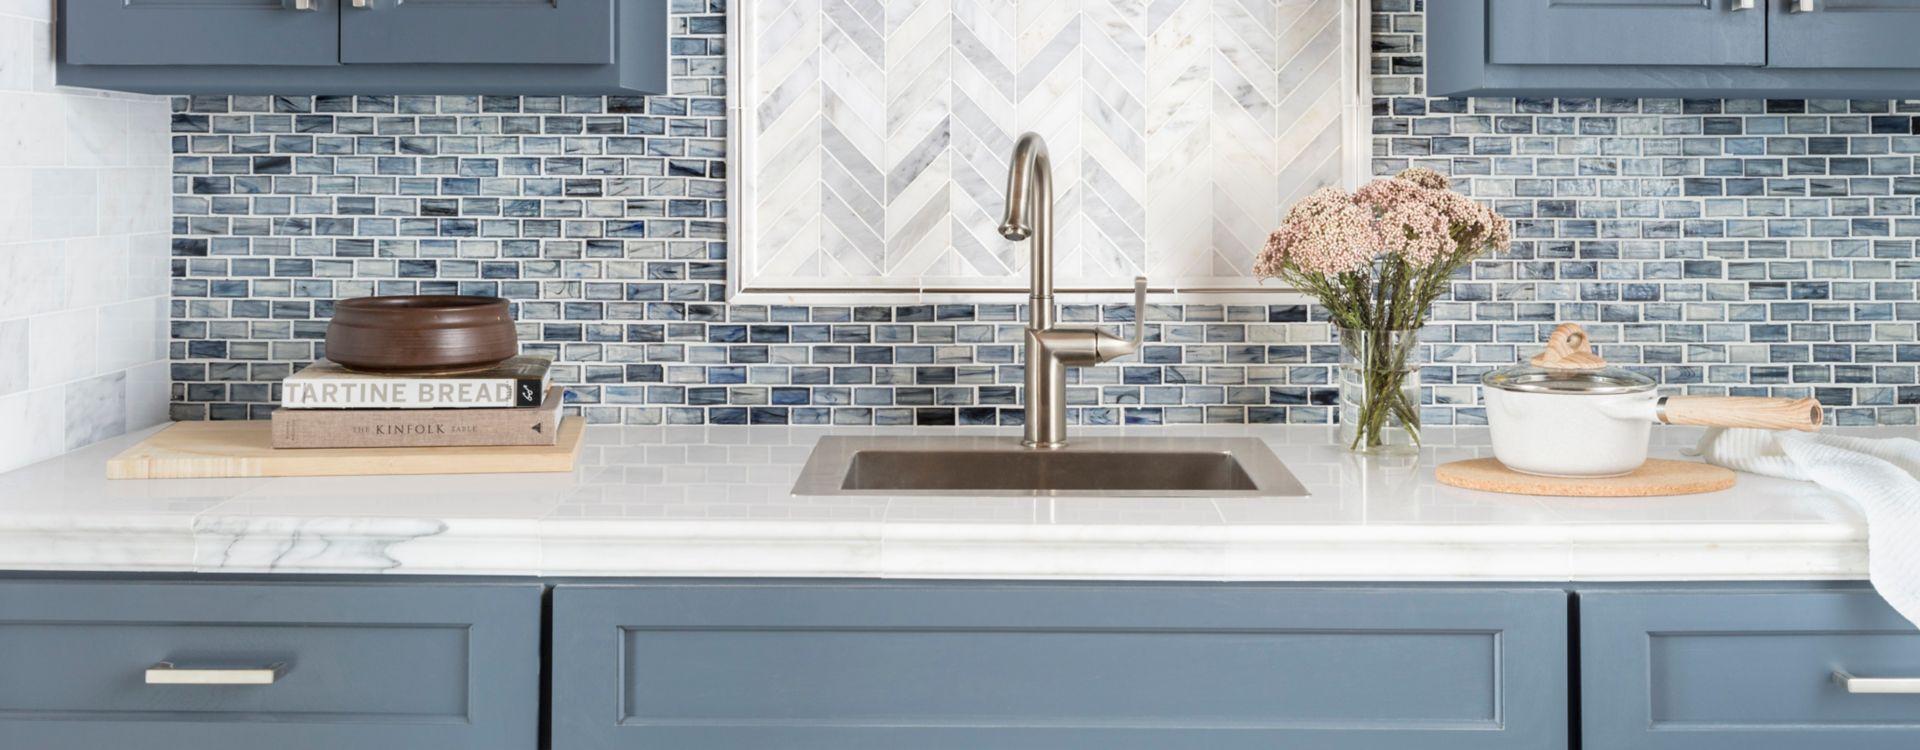 kitchen backsplash tiles.